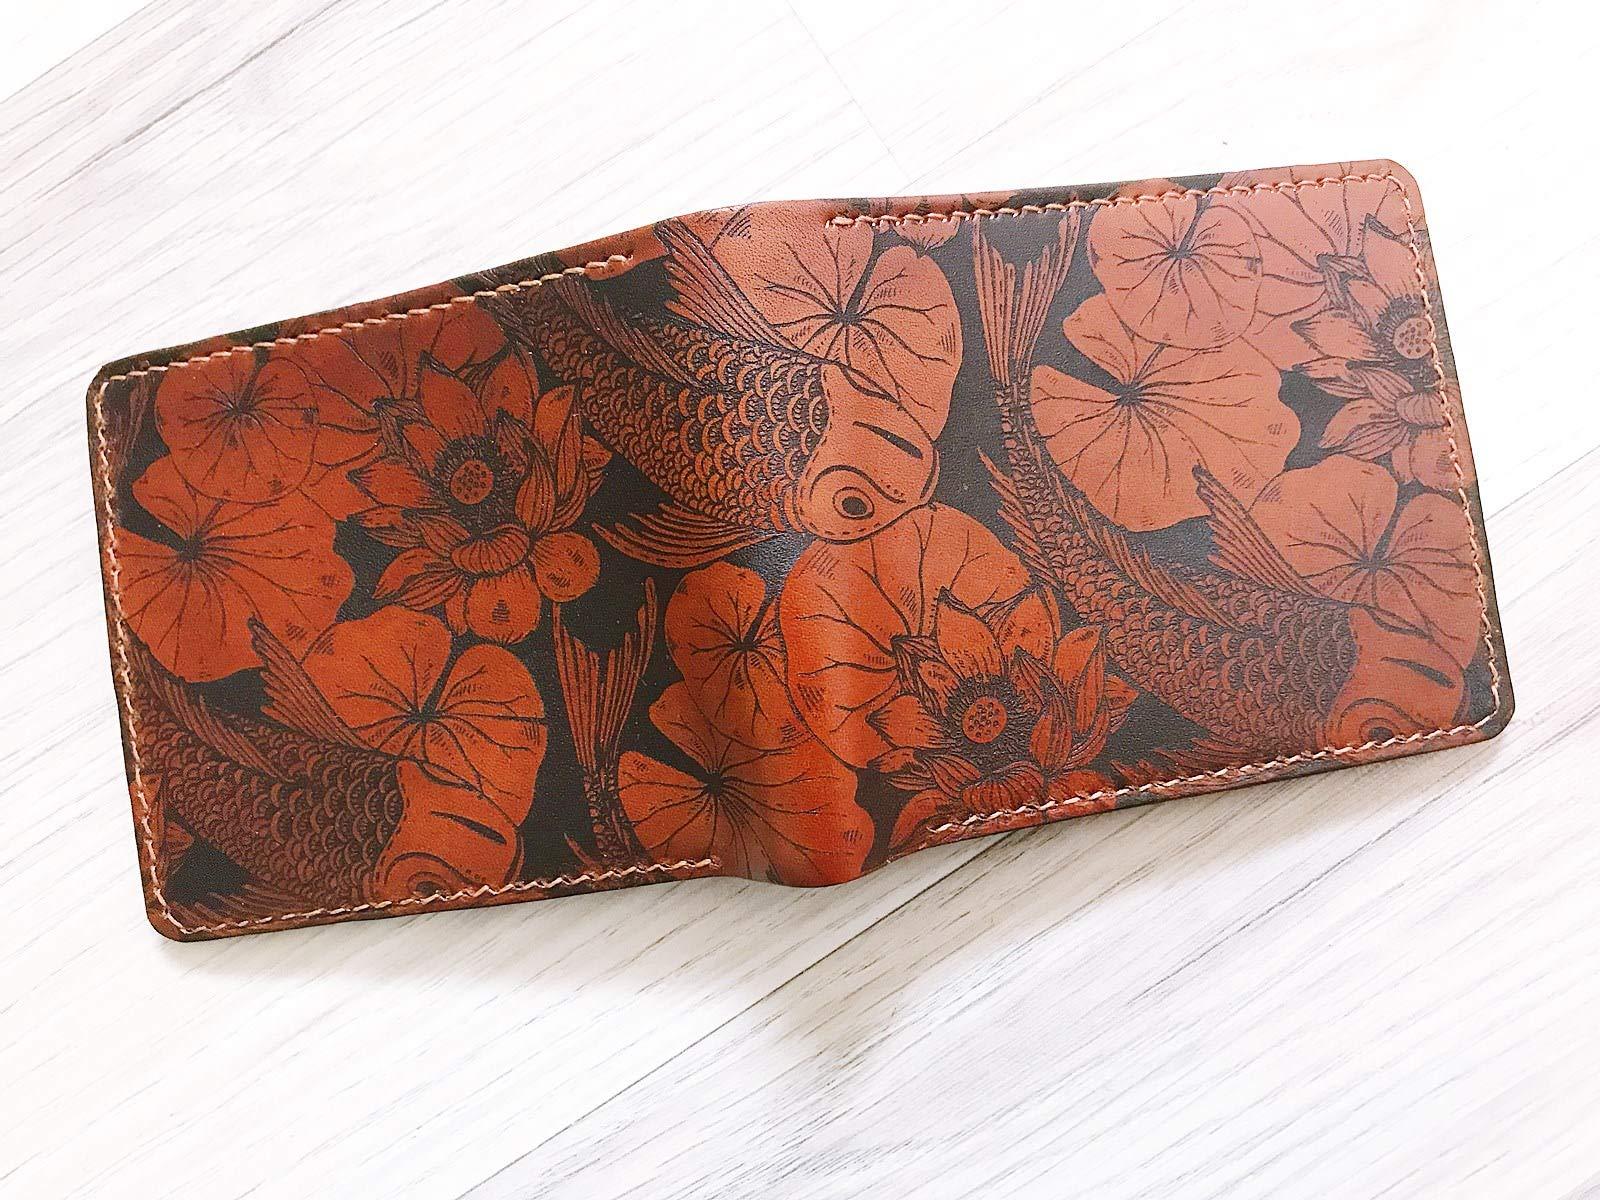 Unik4art - Koi Fish Japanese leather handmade mens wallet anniversary gift - 4LE